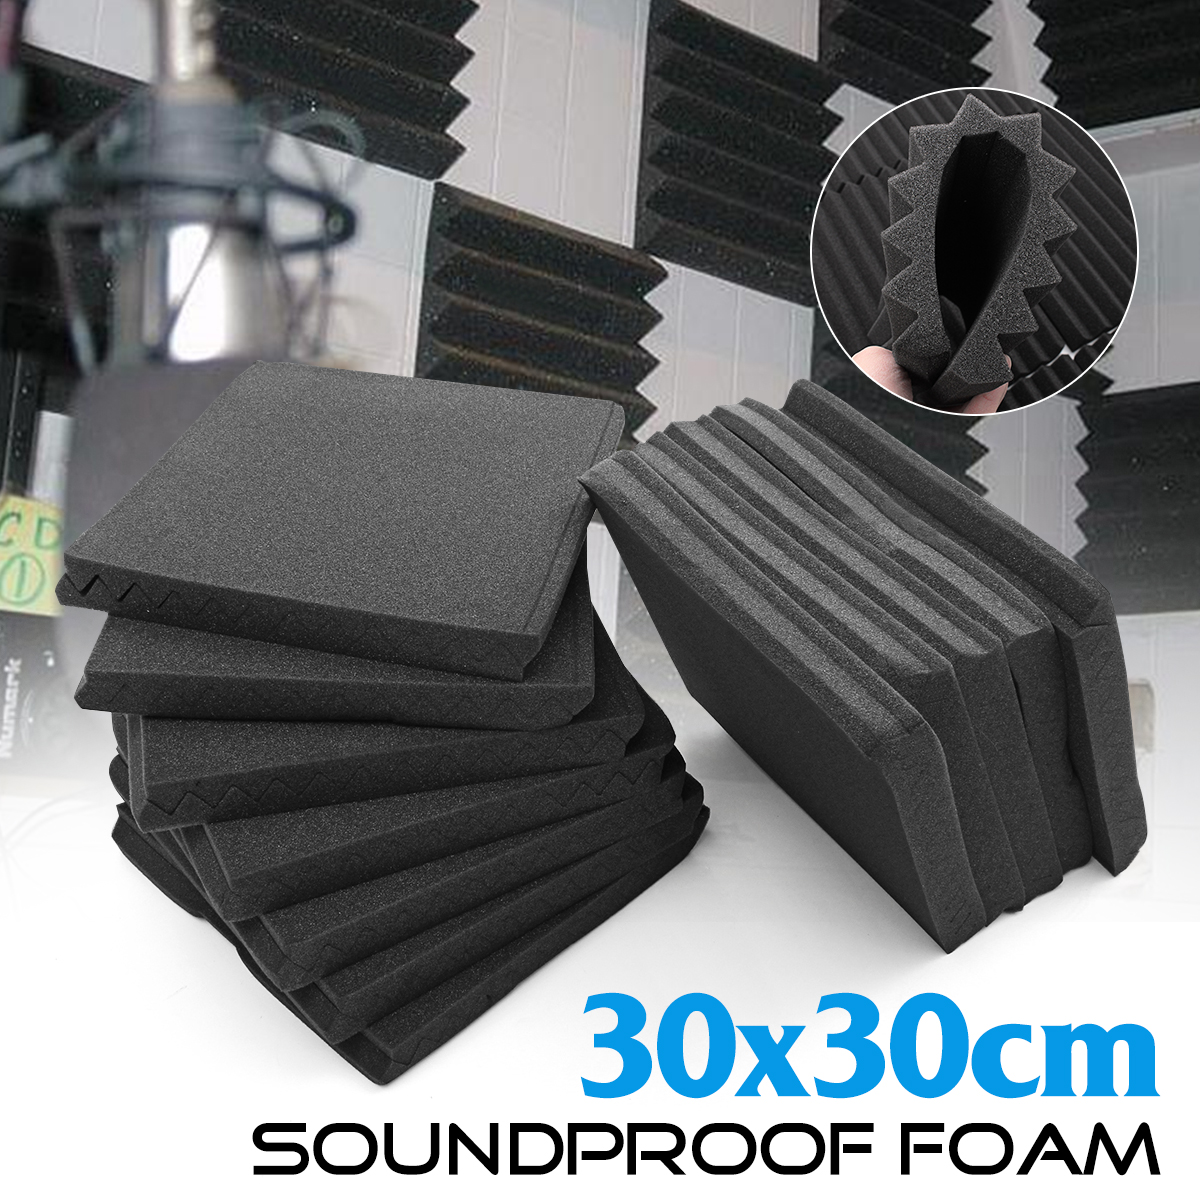 24Pcs 30x30cm Soundproofing Foam Acoustic Sponge Foam Treatment Studio Room Noise Absorption Wedge Tiles Polyurethane Foam 12x soundproofing foam acoustic absording treatment foams home wall car wedge tiles studio foam ktv studio noise sponge foam us